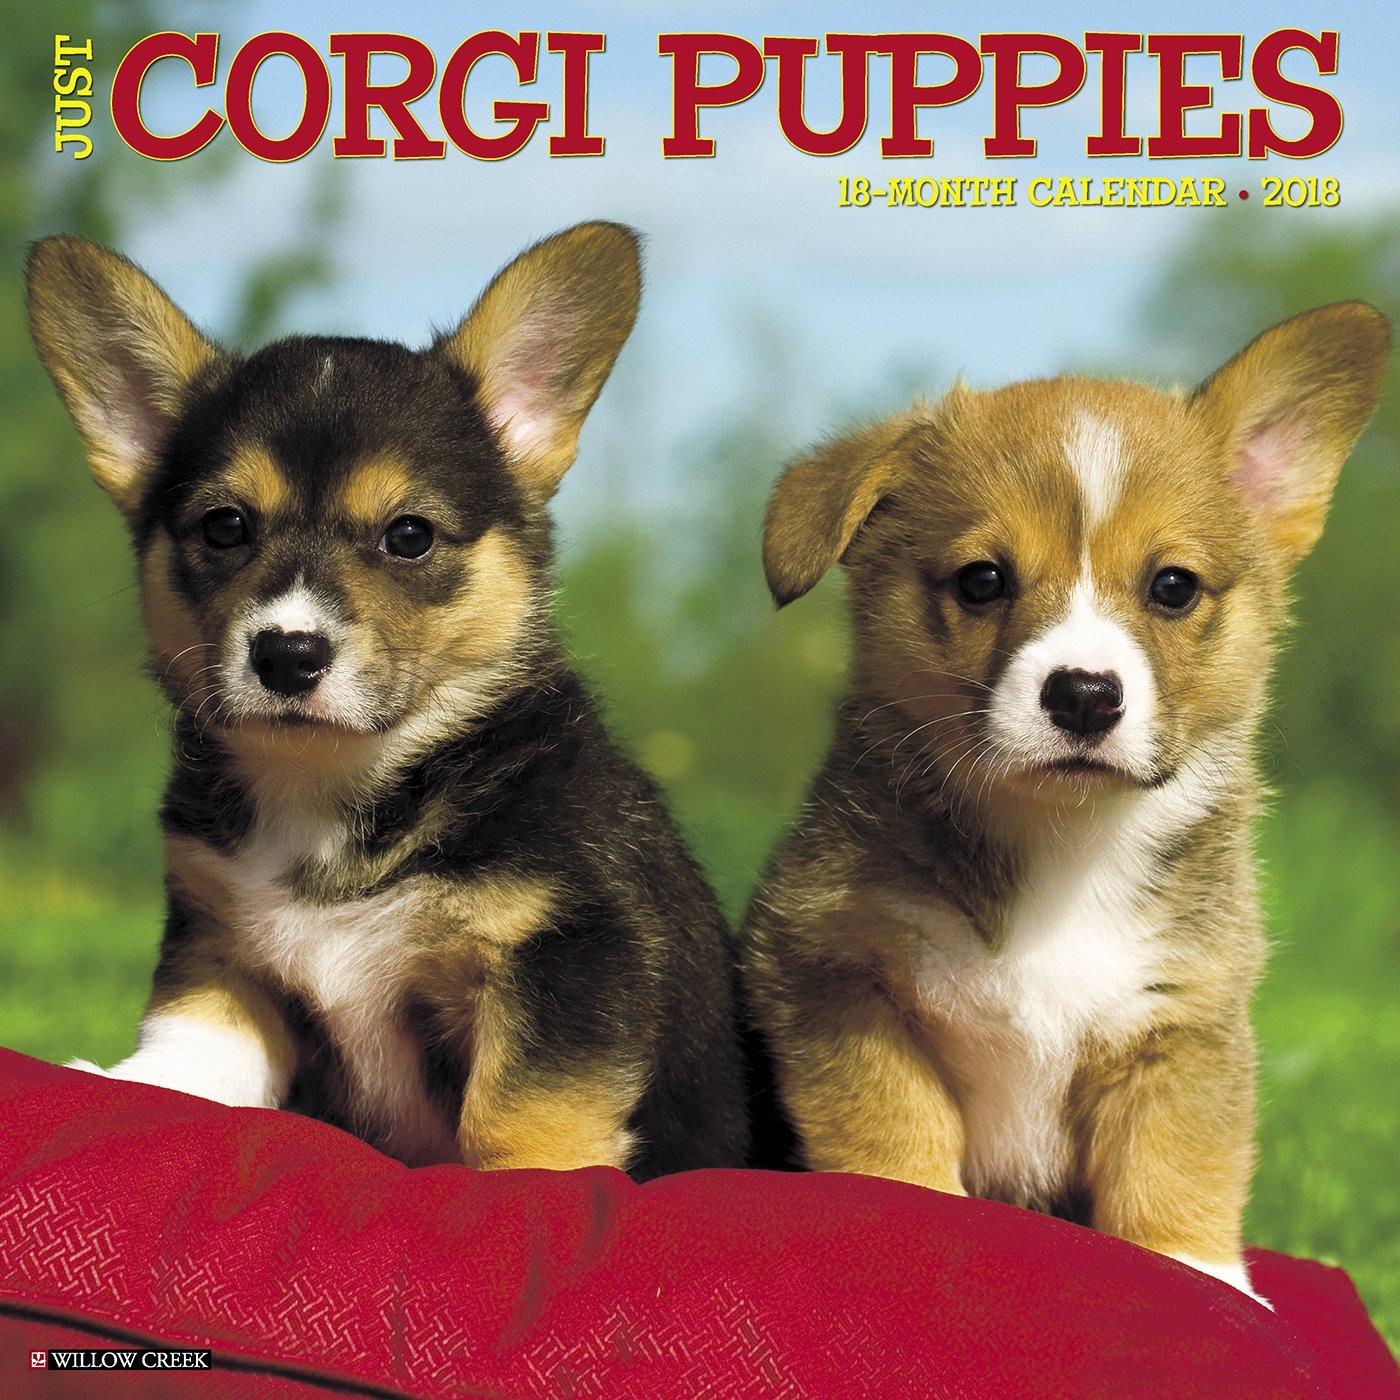 Just Corgi Puppies 2018 Calendar: Willow Creek Press